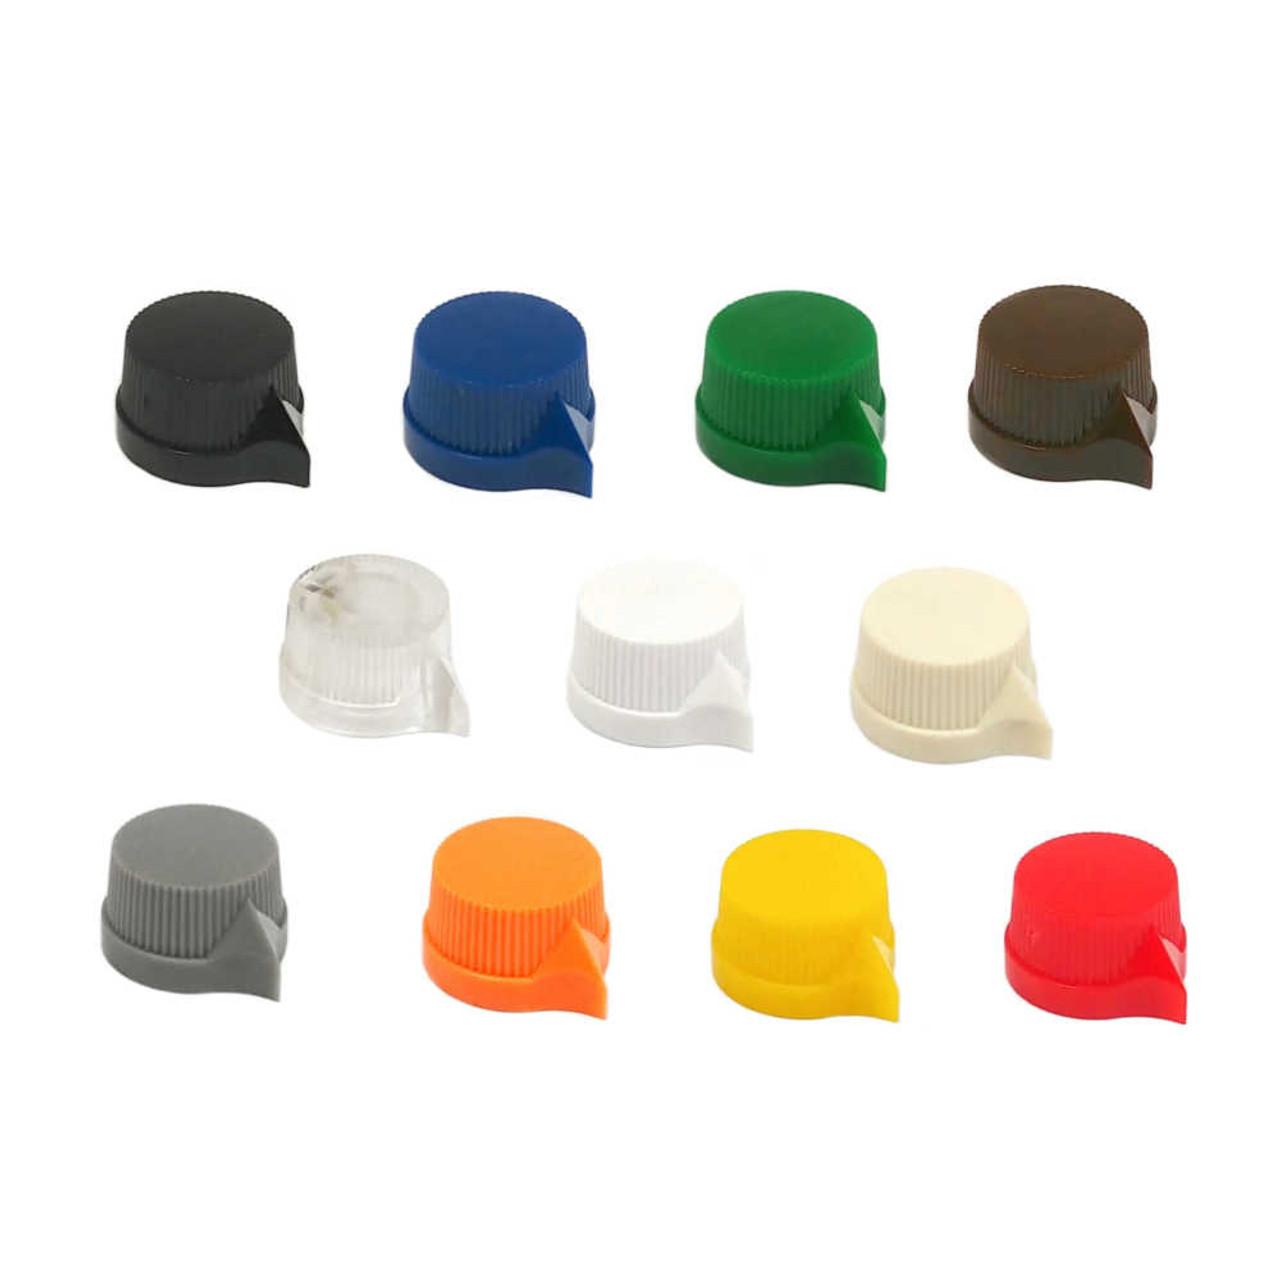 Davies Style 1400 Knob - Choose Colour